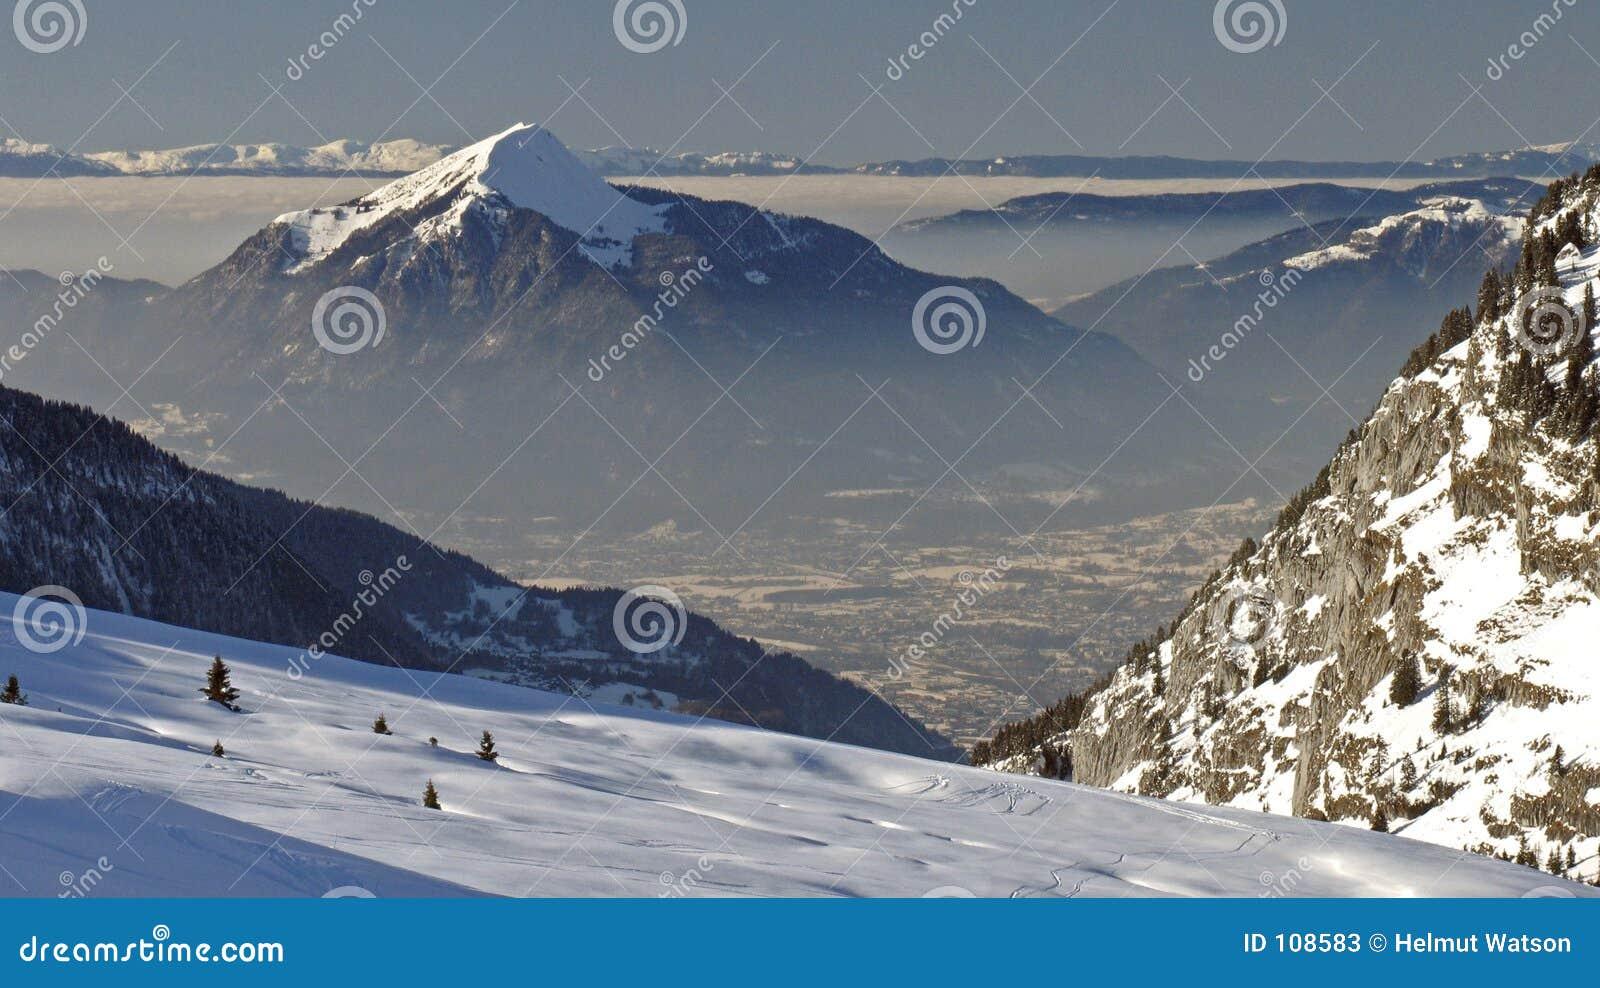 Flaine - snowy peak